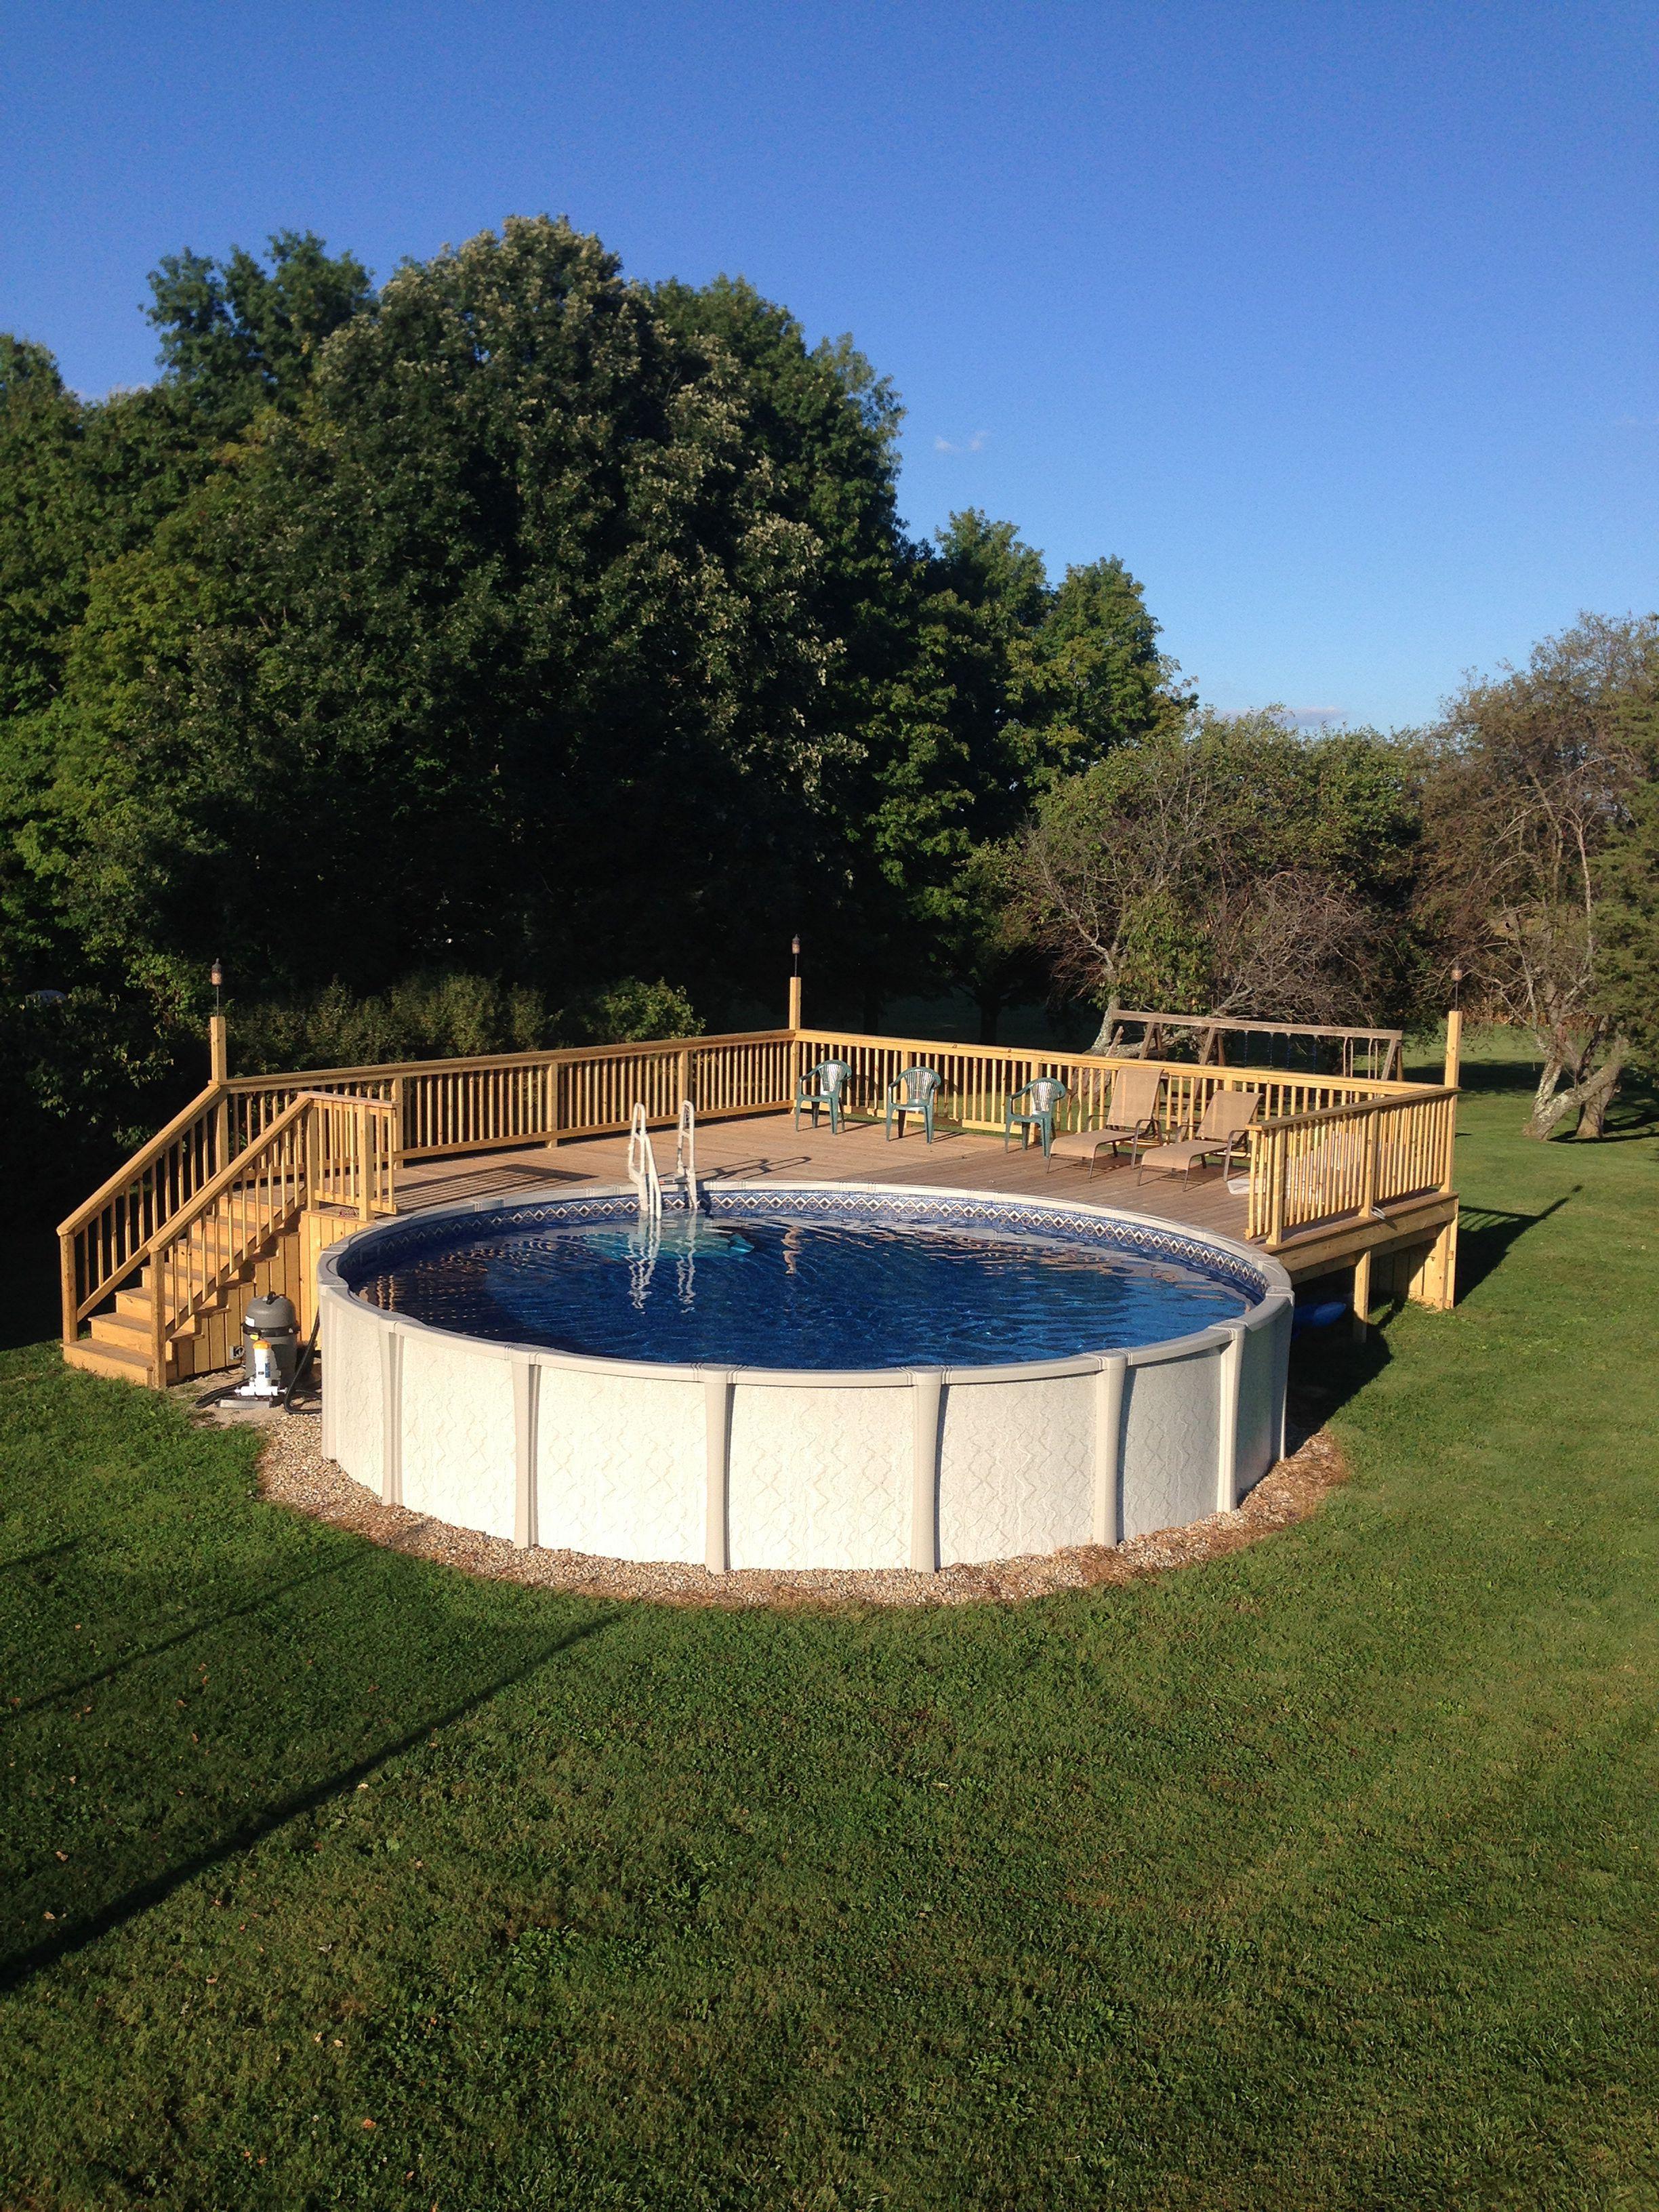 Pool Ideas On A Budget diy swimming pool ideas more Top 26 Diy Above Ground Pool Ideas On A Budget